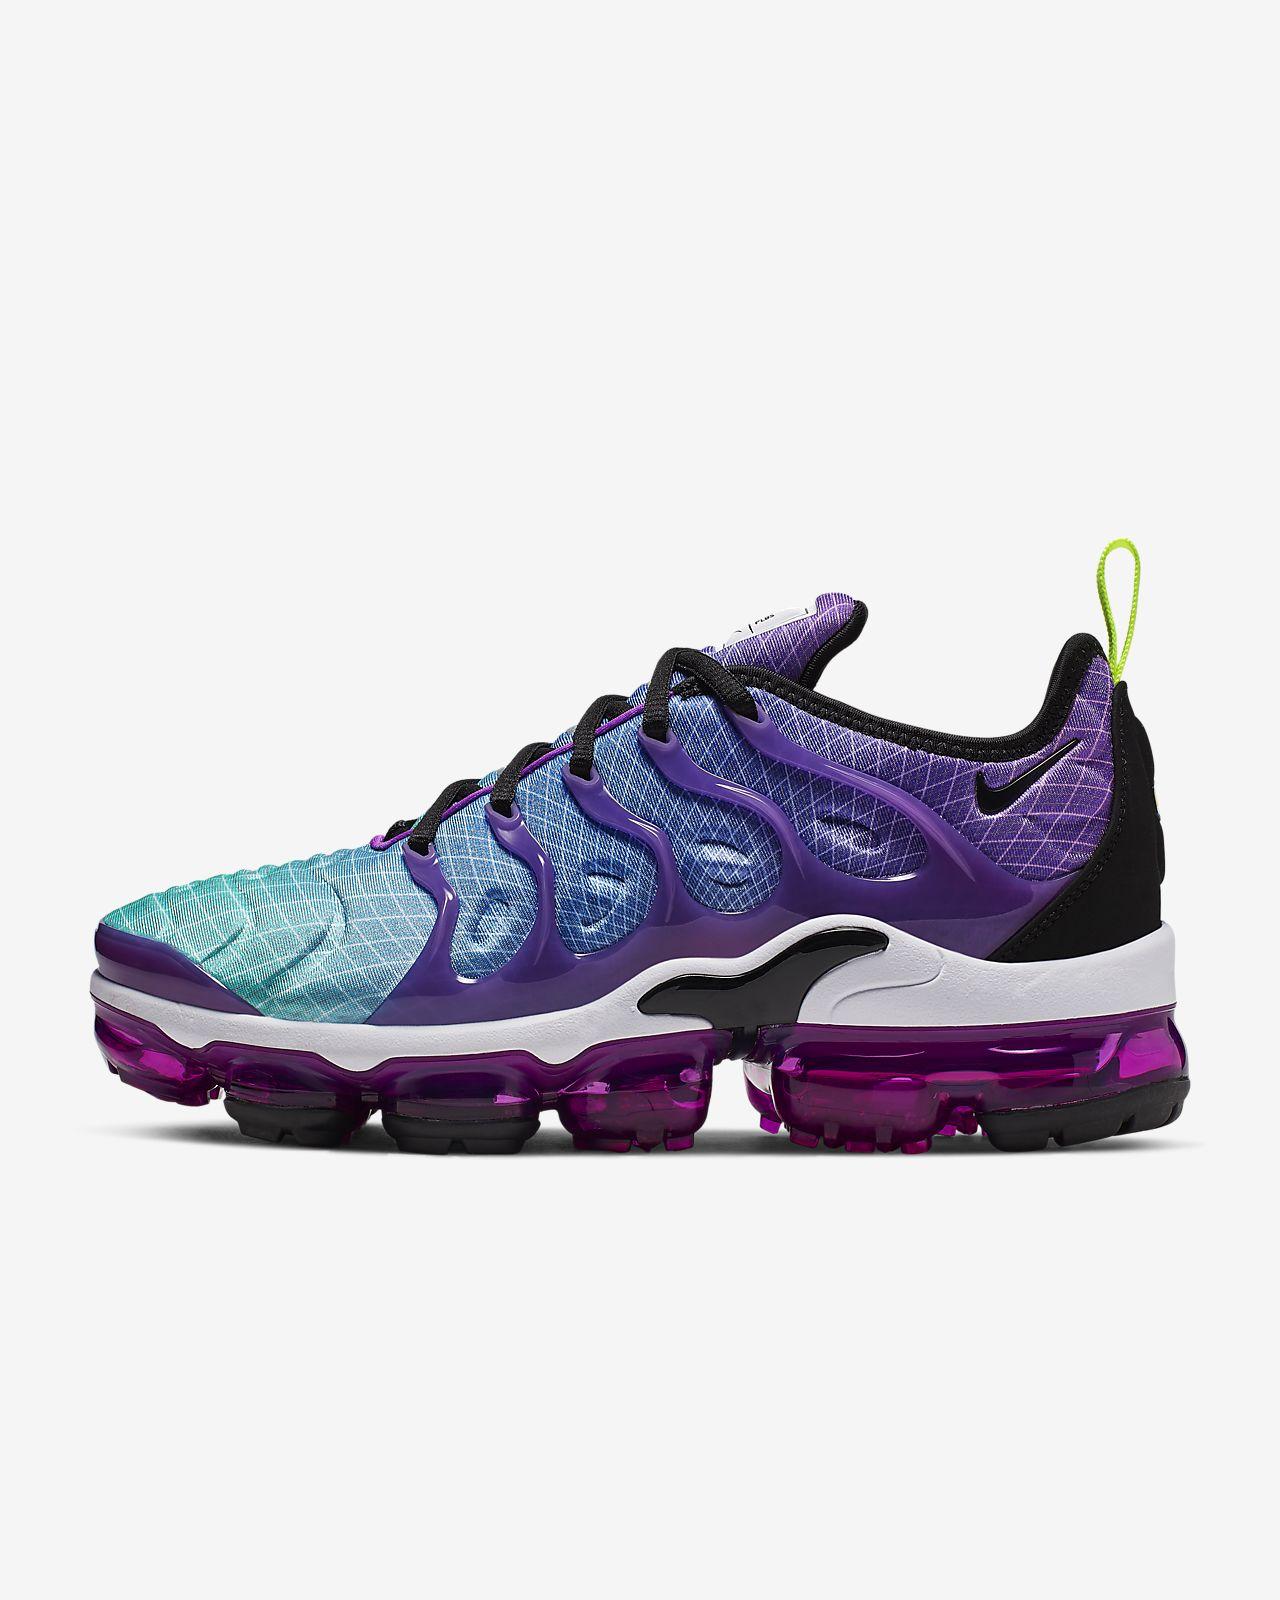 Nike Air Max 97 « Sneaker outlet « Vycsas